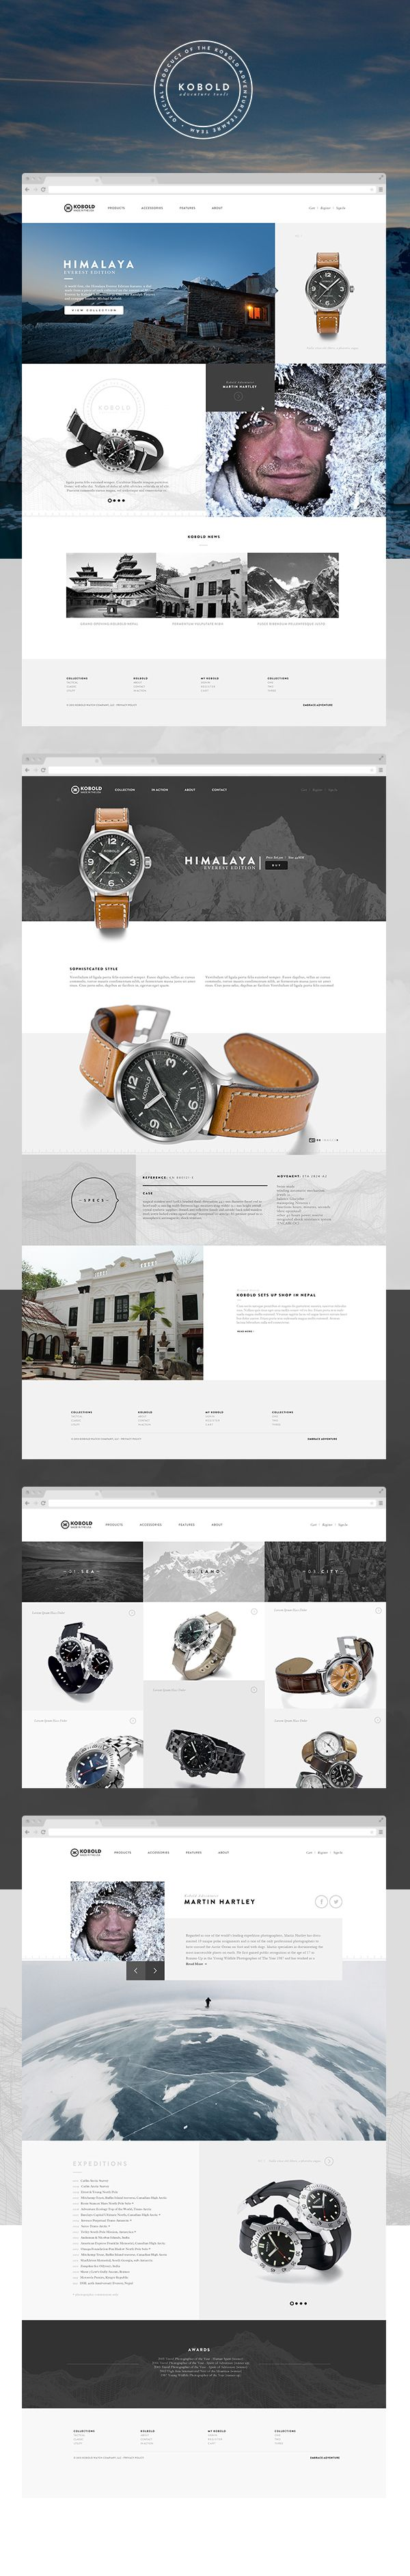 Kobold Watches 2013 by Douglas Hughmanick, via Behance